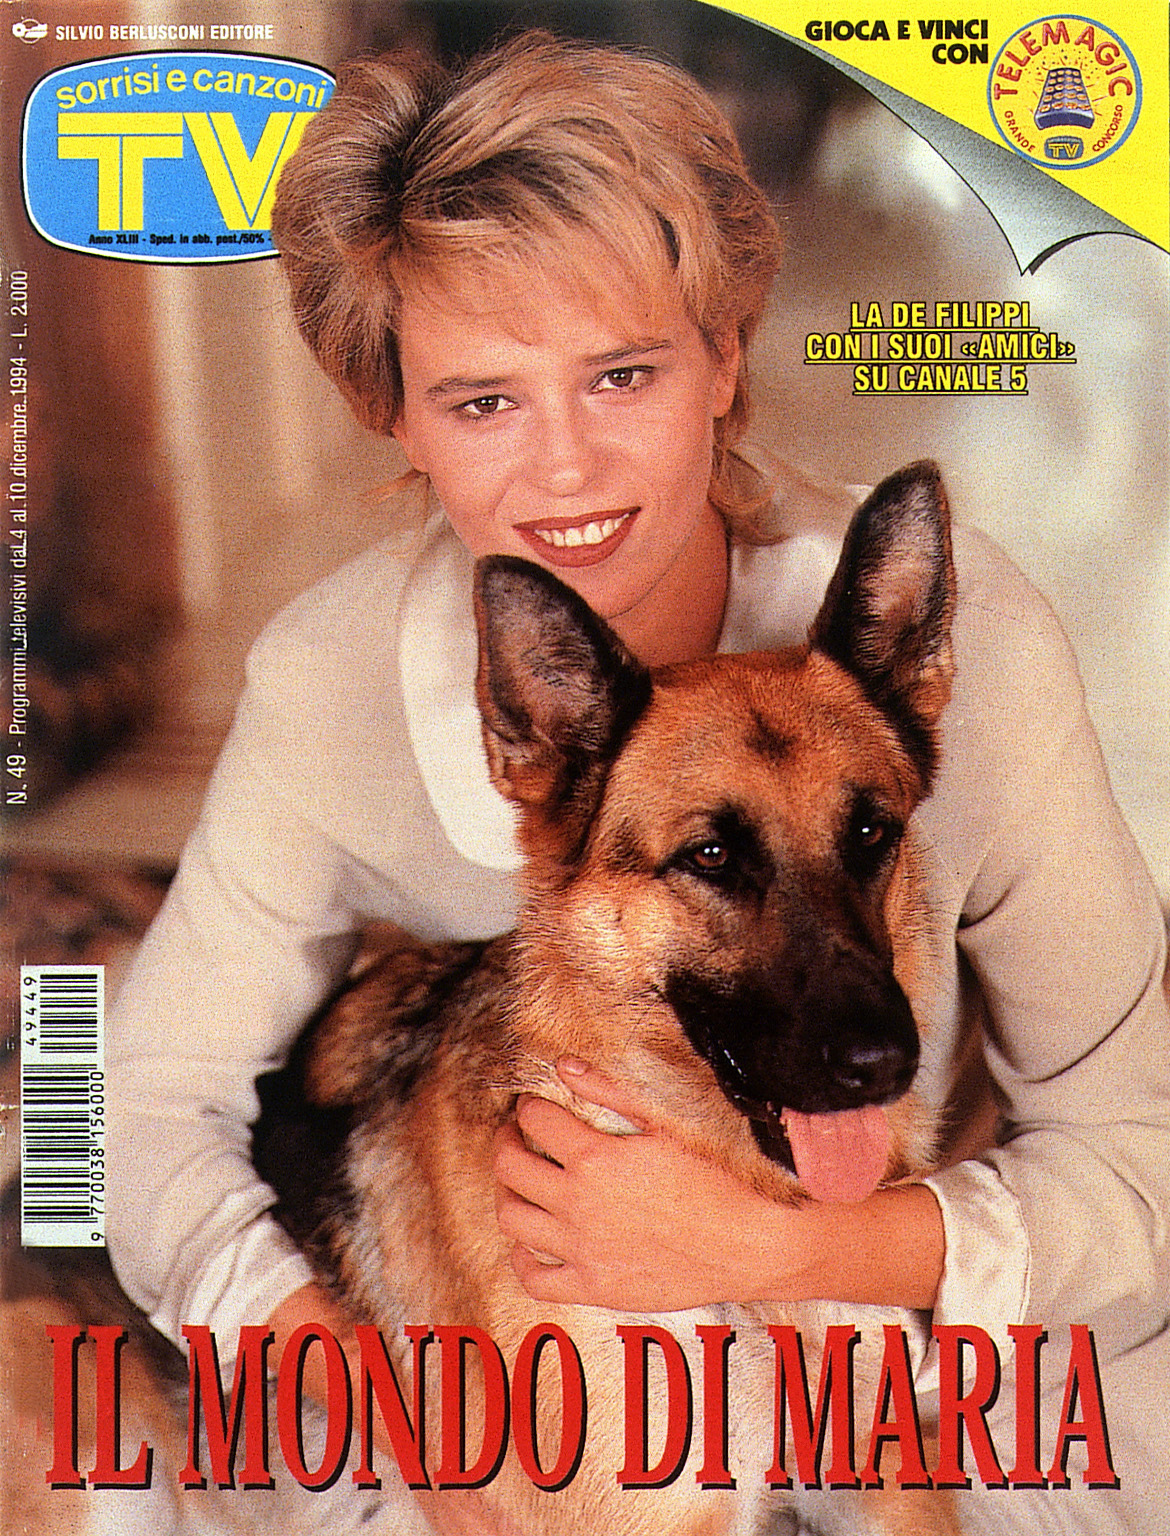 Sorrisi e Canzoni TV - Copertina dedicata a Maria De Filippi - 1994 -